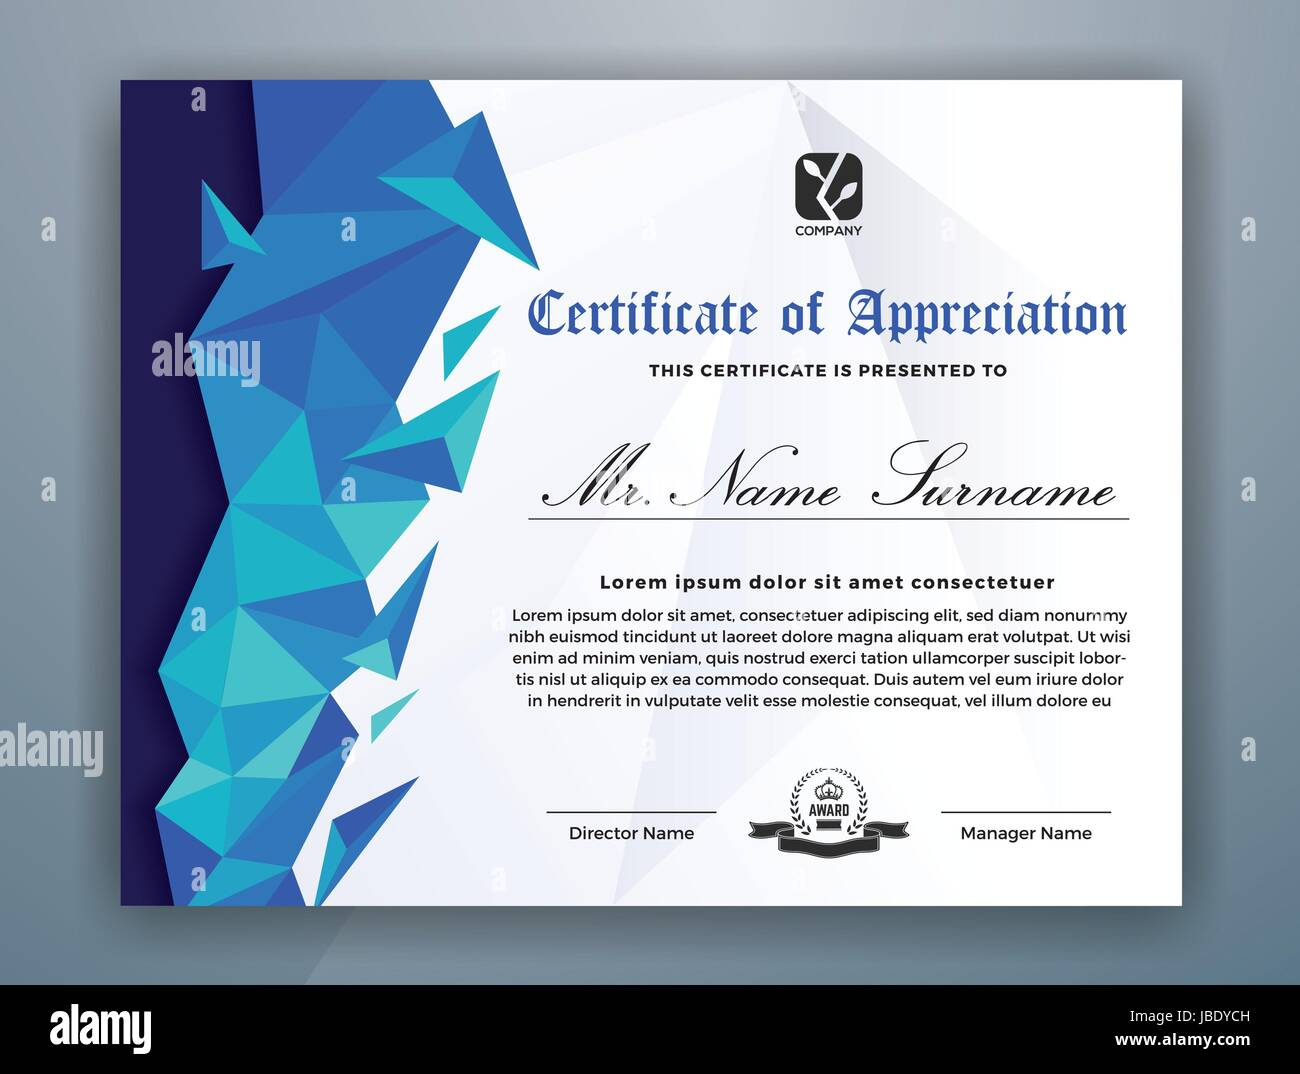 Multipurpose modern professional certificate template design for multipurpose modern professional certificate template design for print vector illustration yelopaper Gallery